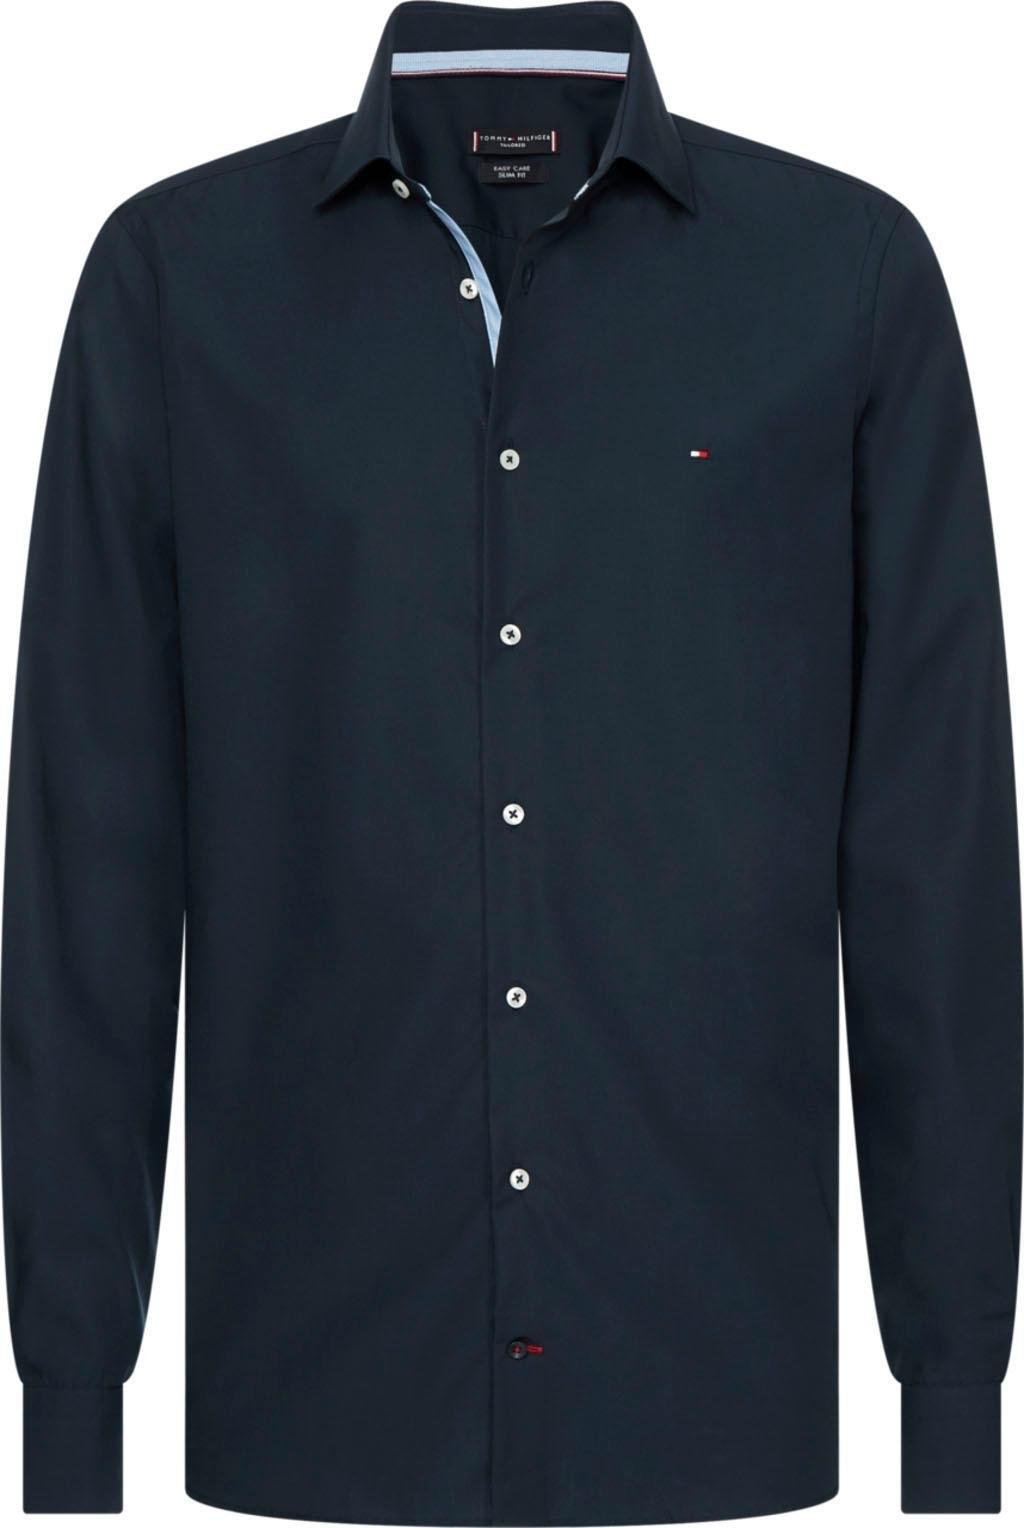 Tommy Hilfiger TAILORED businessoverhemd POPLIN CLASSIC SLIM SHIRT met verborgen contrastbeleg veilig op otto.nl kopen